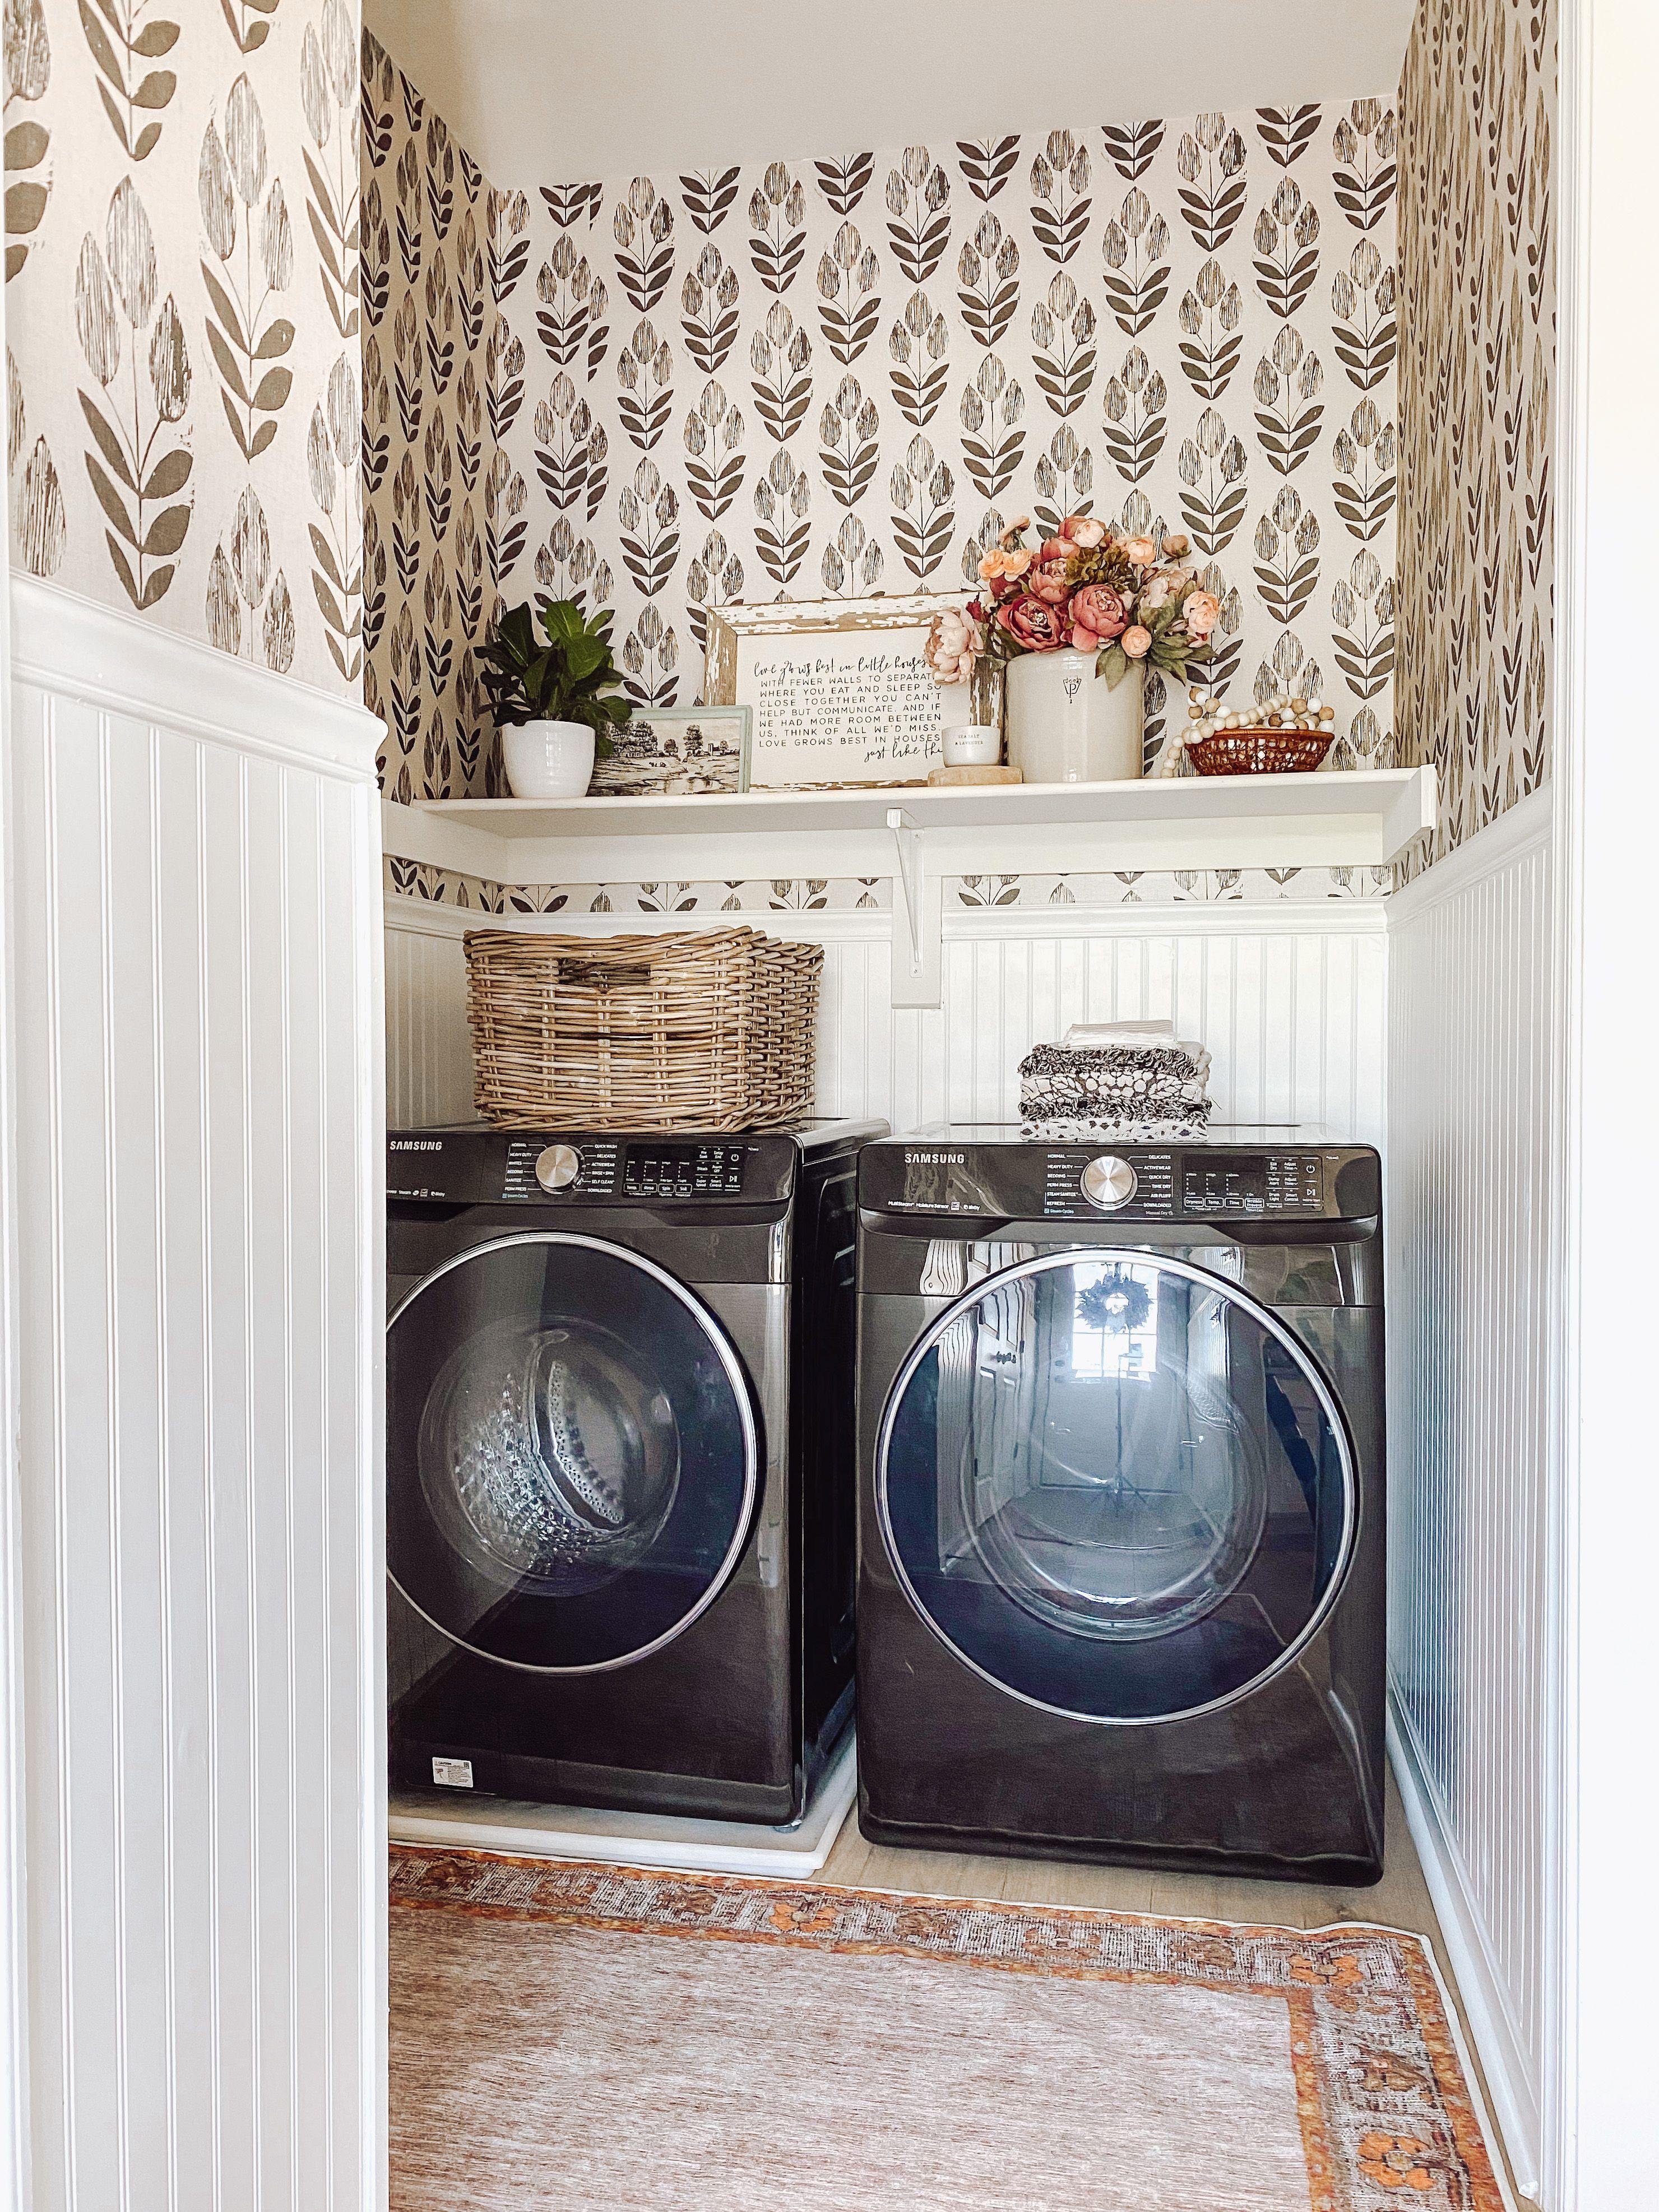 One Line Banana Leaf Peel And Stick Wallpaper Modern Etsy Laundry Room Wallpaper Laundry Room Inspiration Home Decor